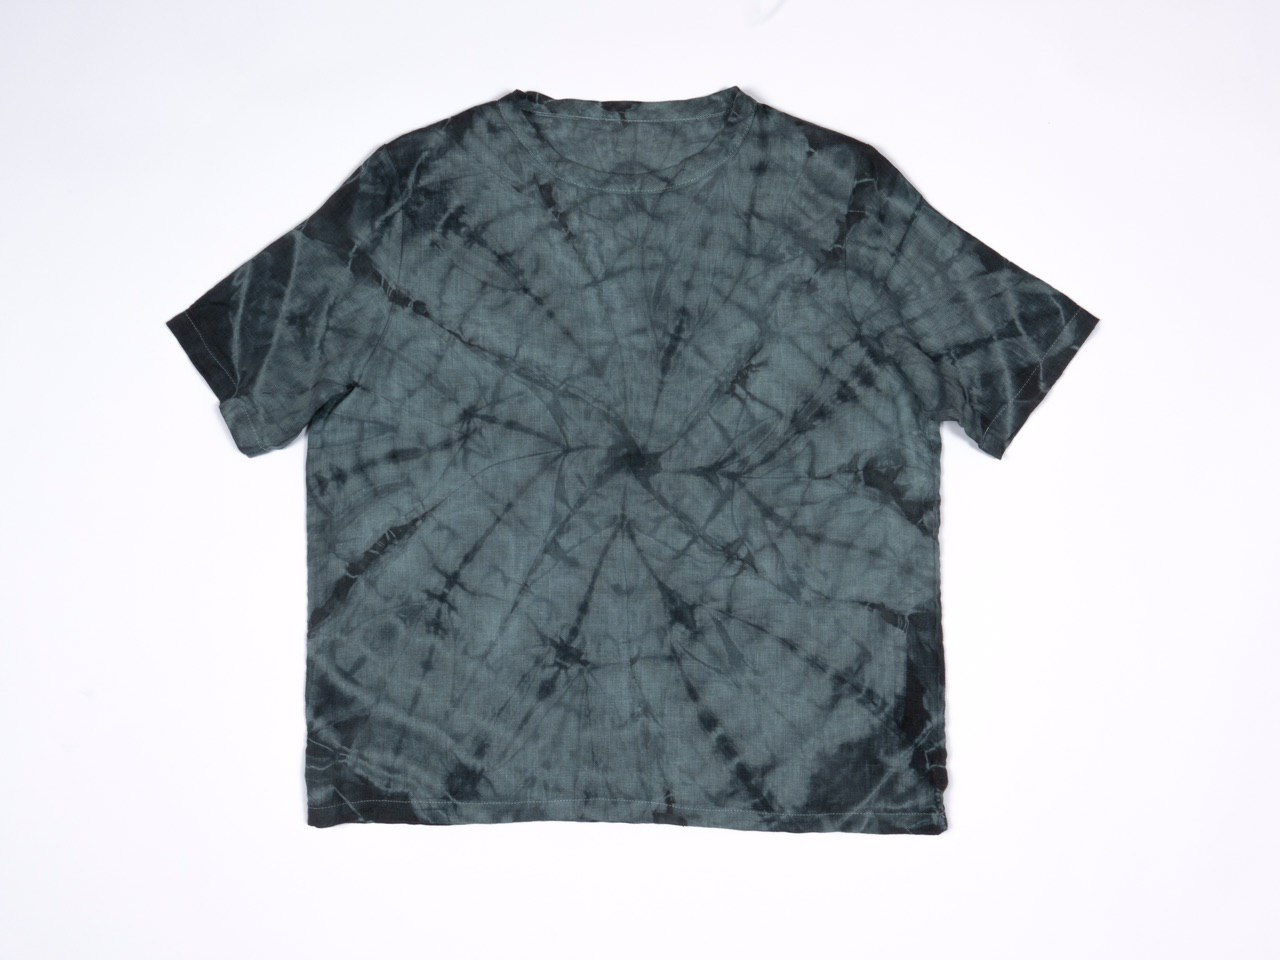 Блакитна лляна футболка з принтом тай-дай